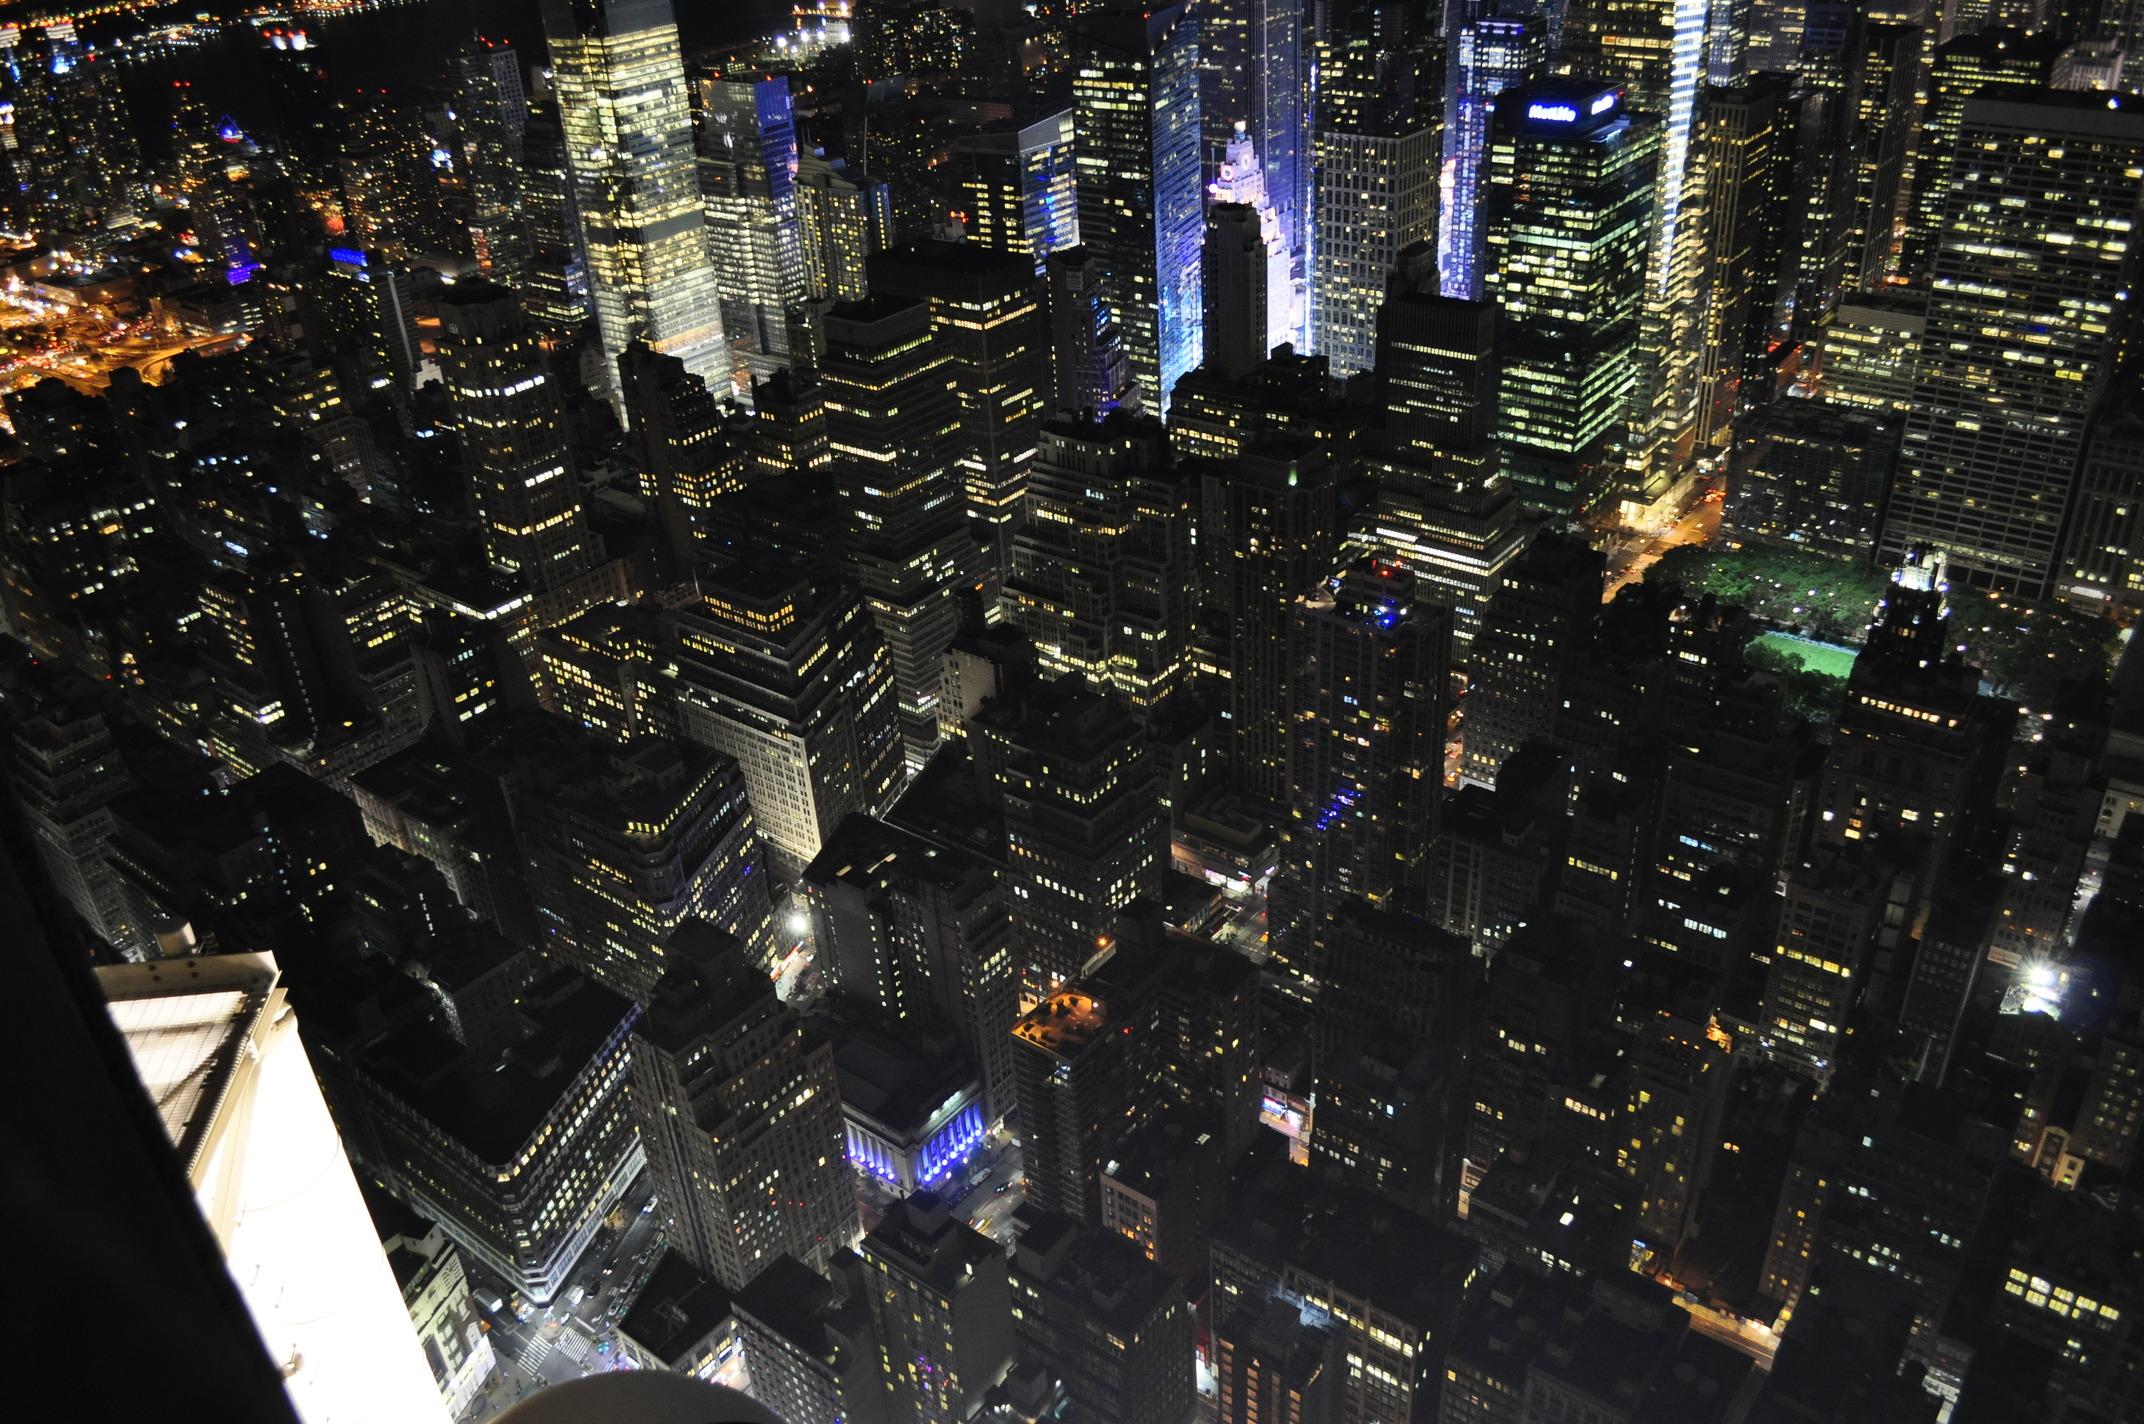 Night lights by Alberto Salvia Novella